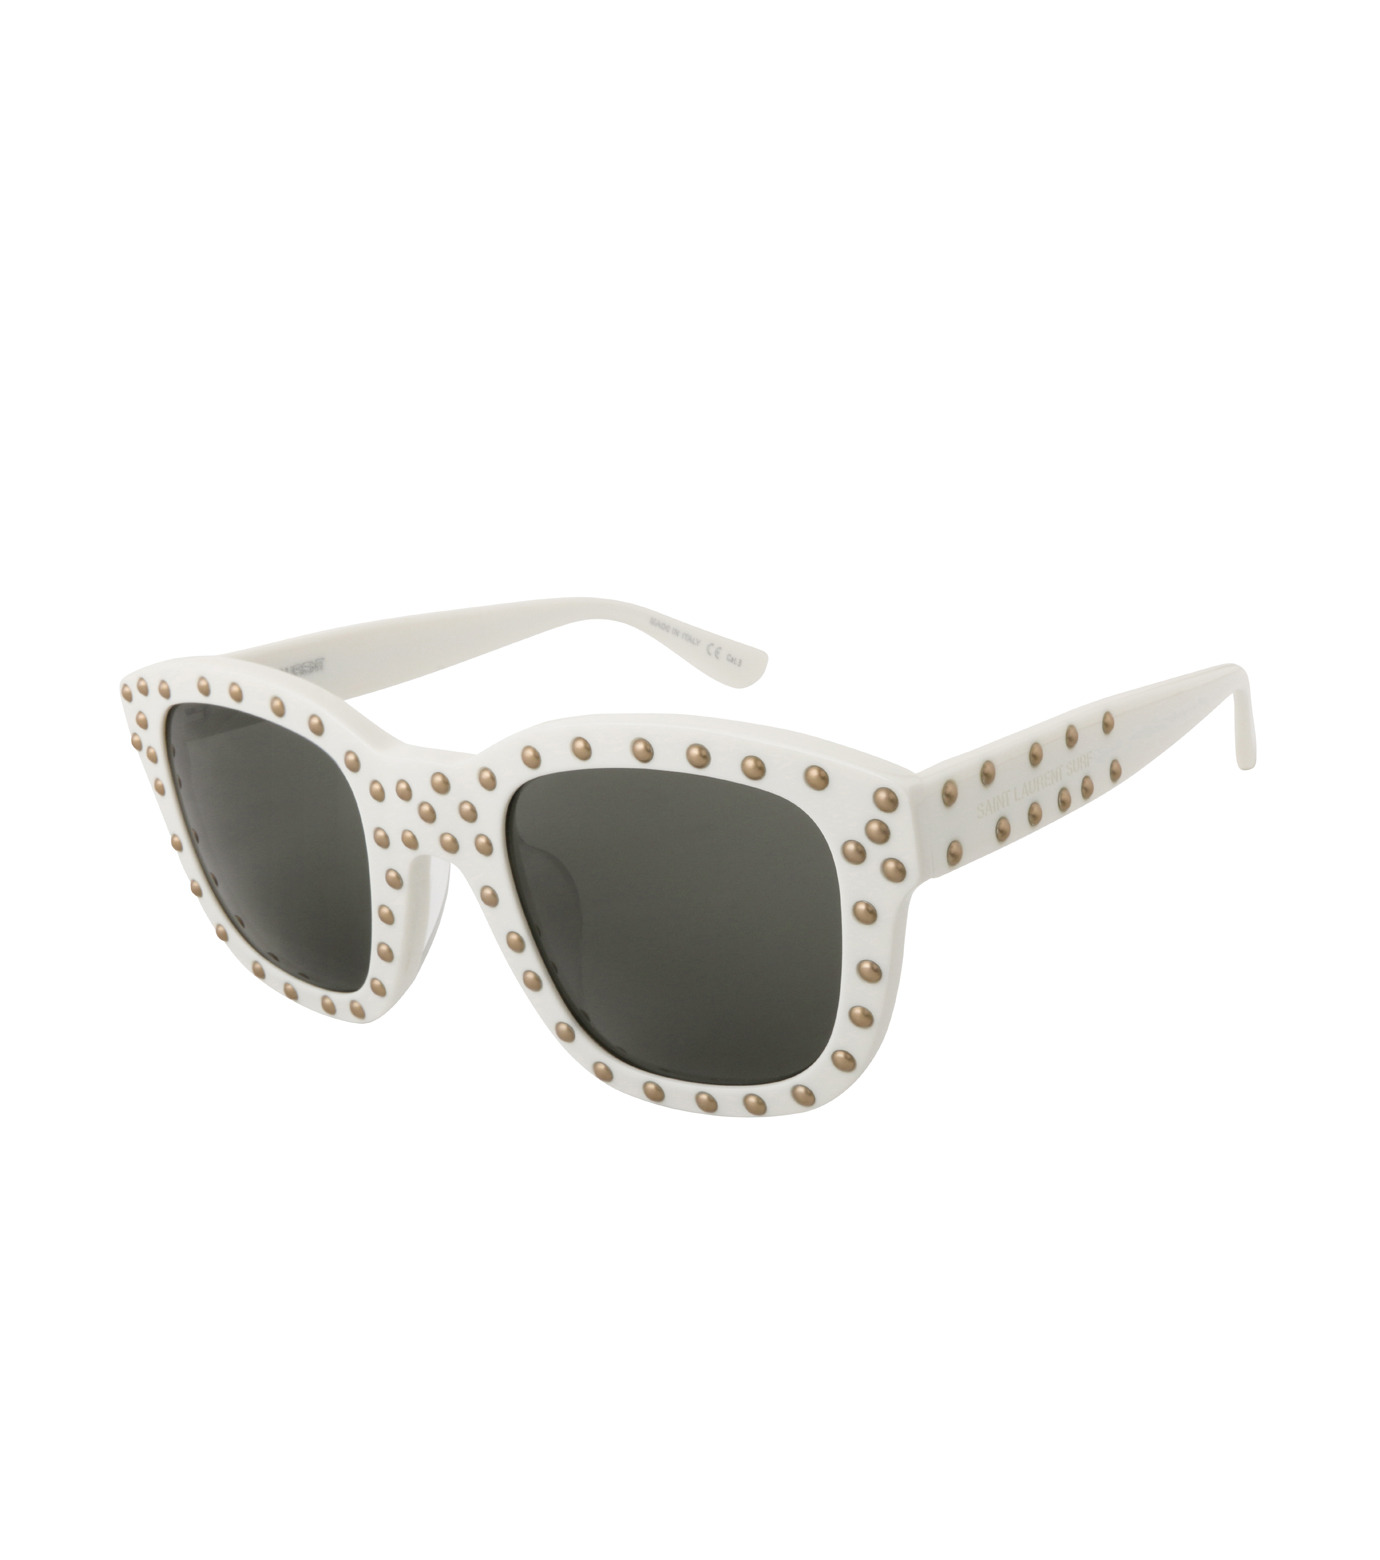 SAINT LAURENT(サンローラン)のSL 100 Lou Studded-WHITE(アイウェア/eyewear)-420137-4 拡大詳細画像1